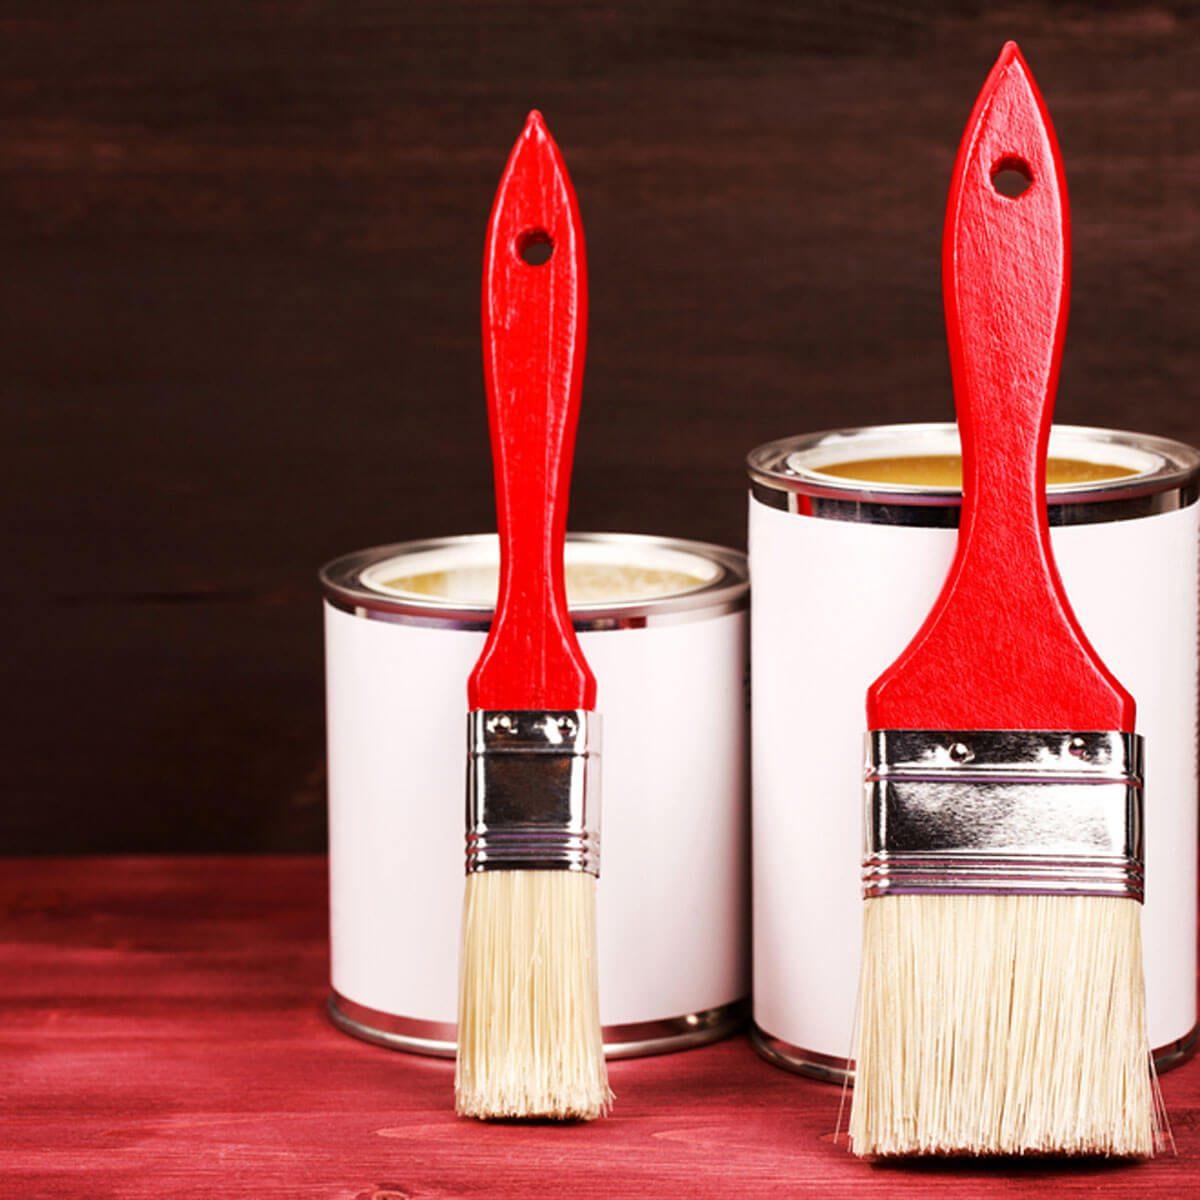 dfh1_shutterstock_497543731 paint bucket brushes